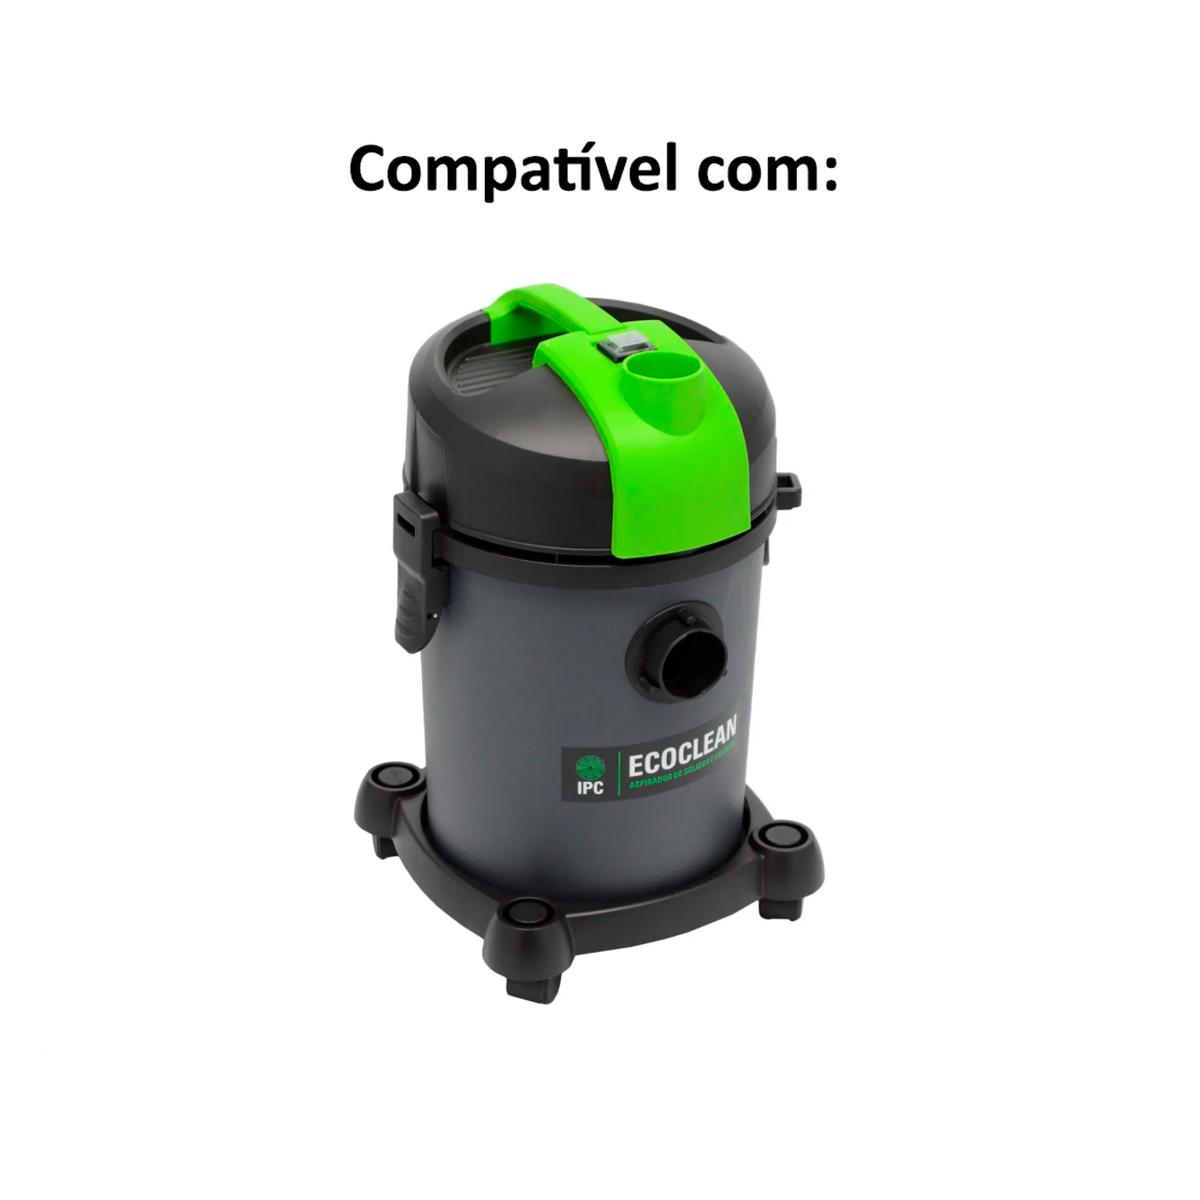 Filtro para Aspirador de pó IPC Ecoclean Original